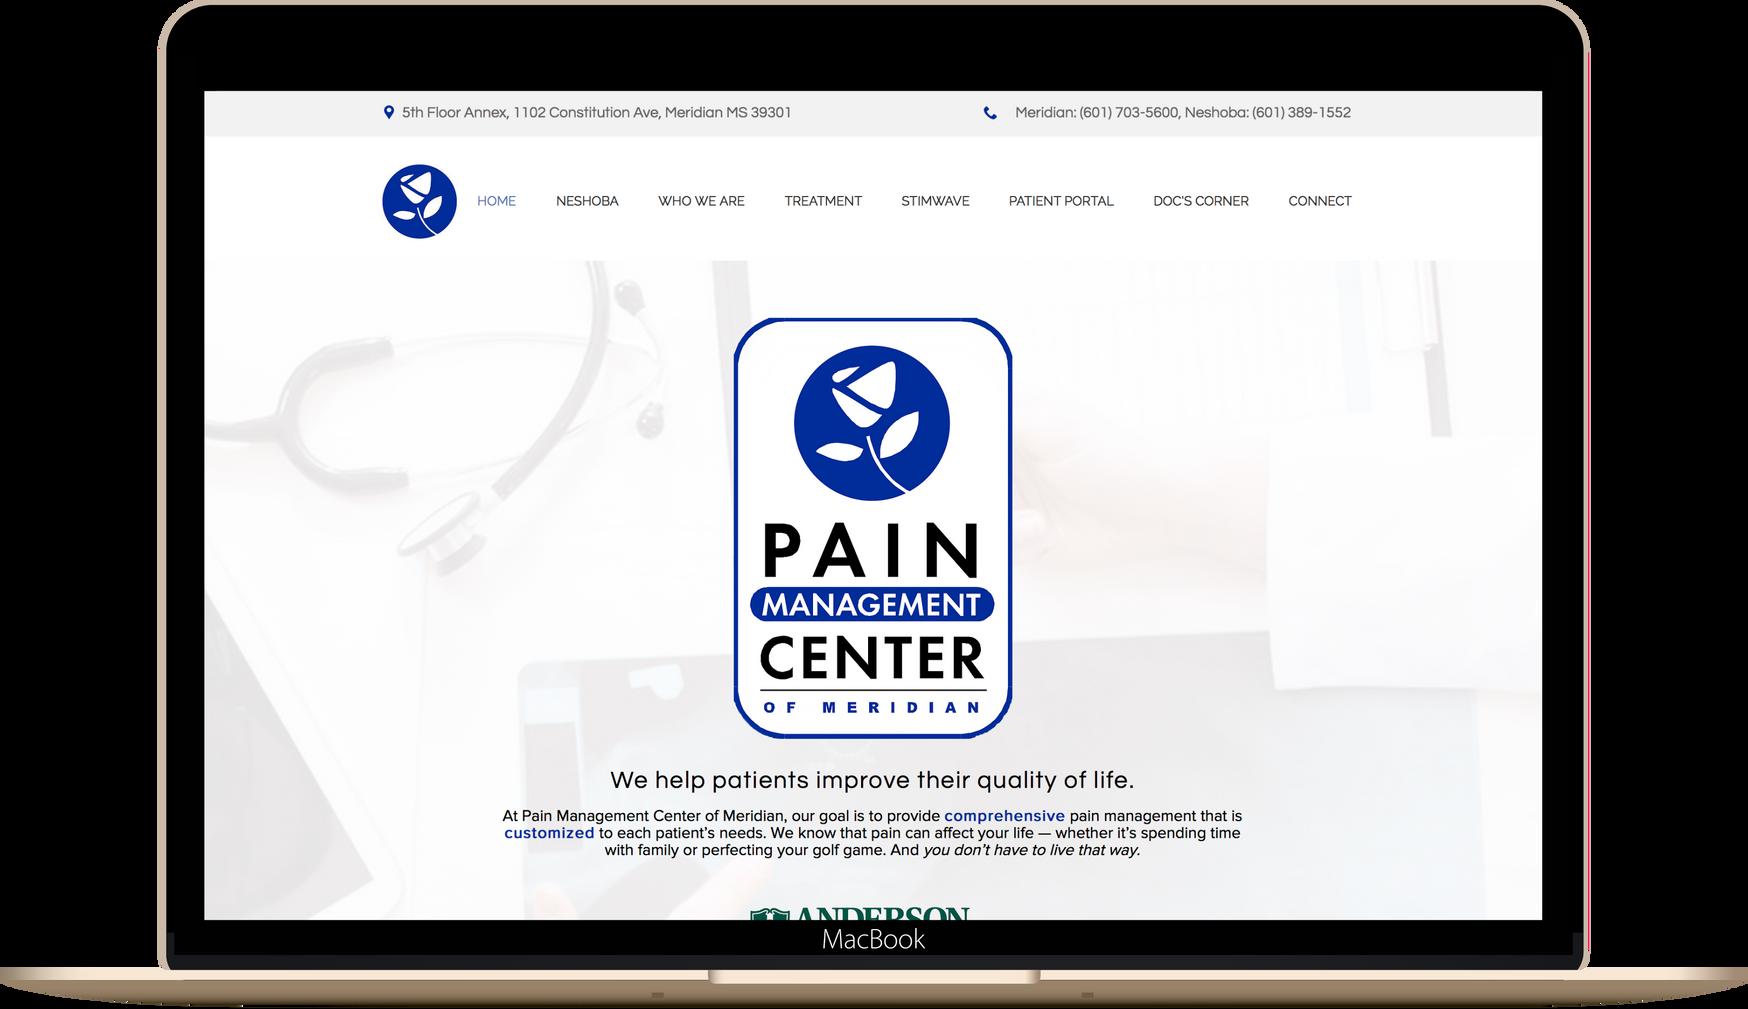 Pain Management Center of Meridian